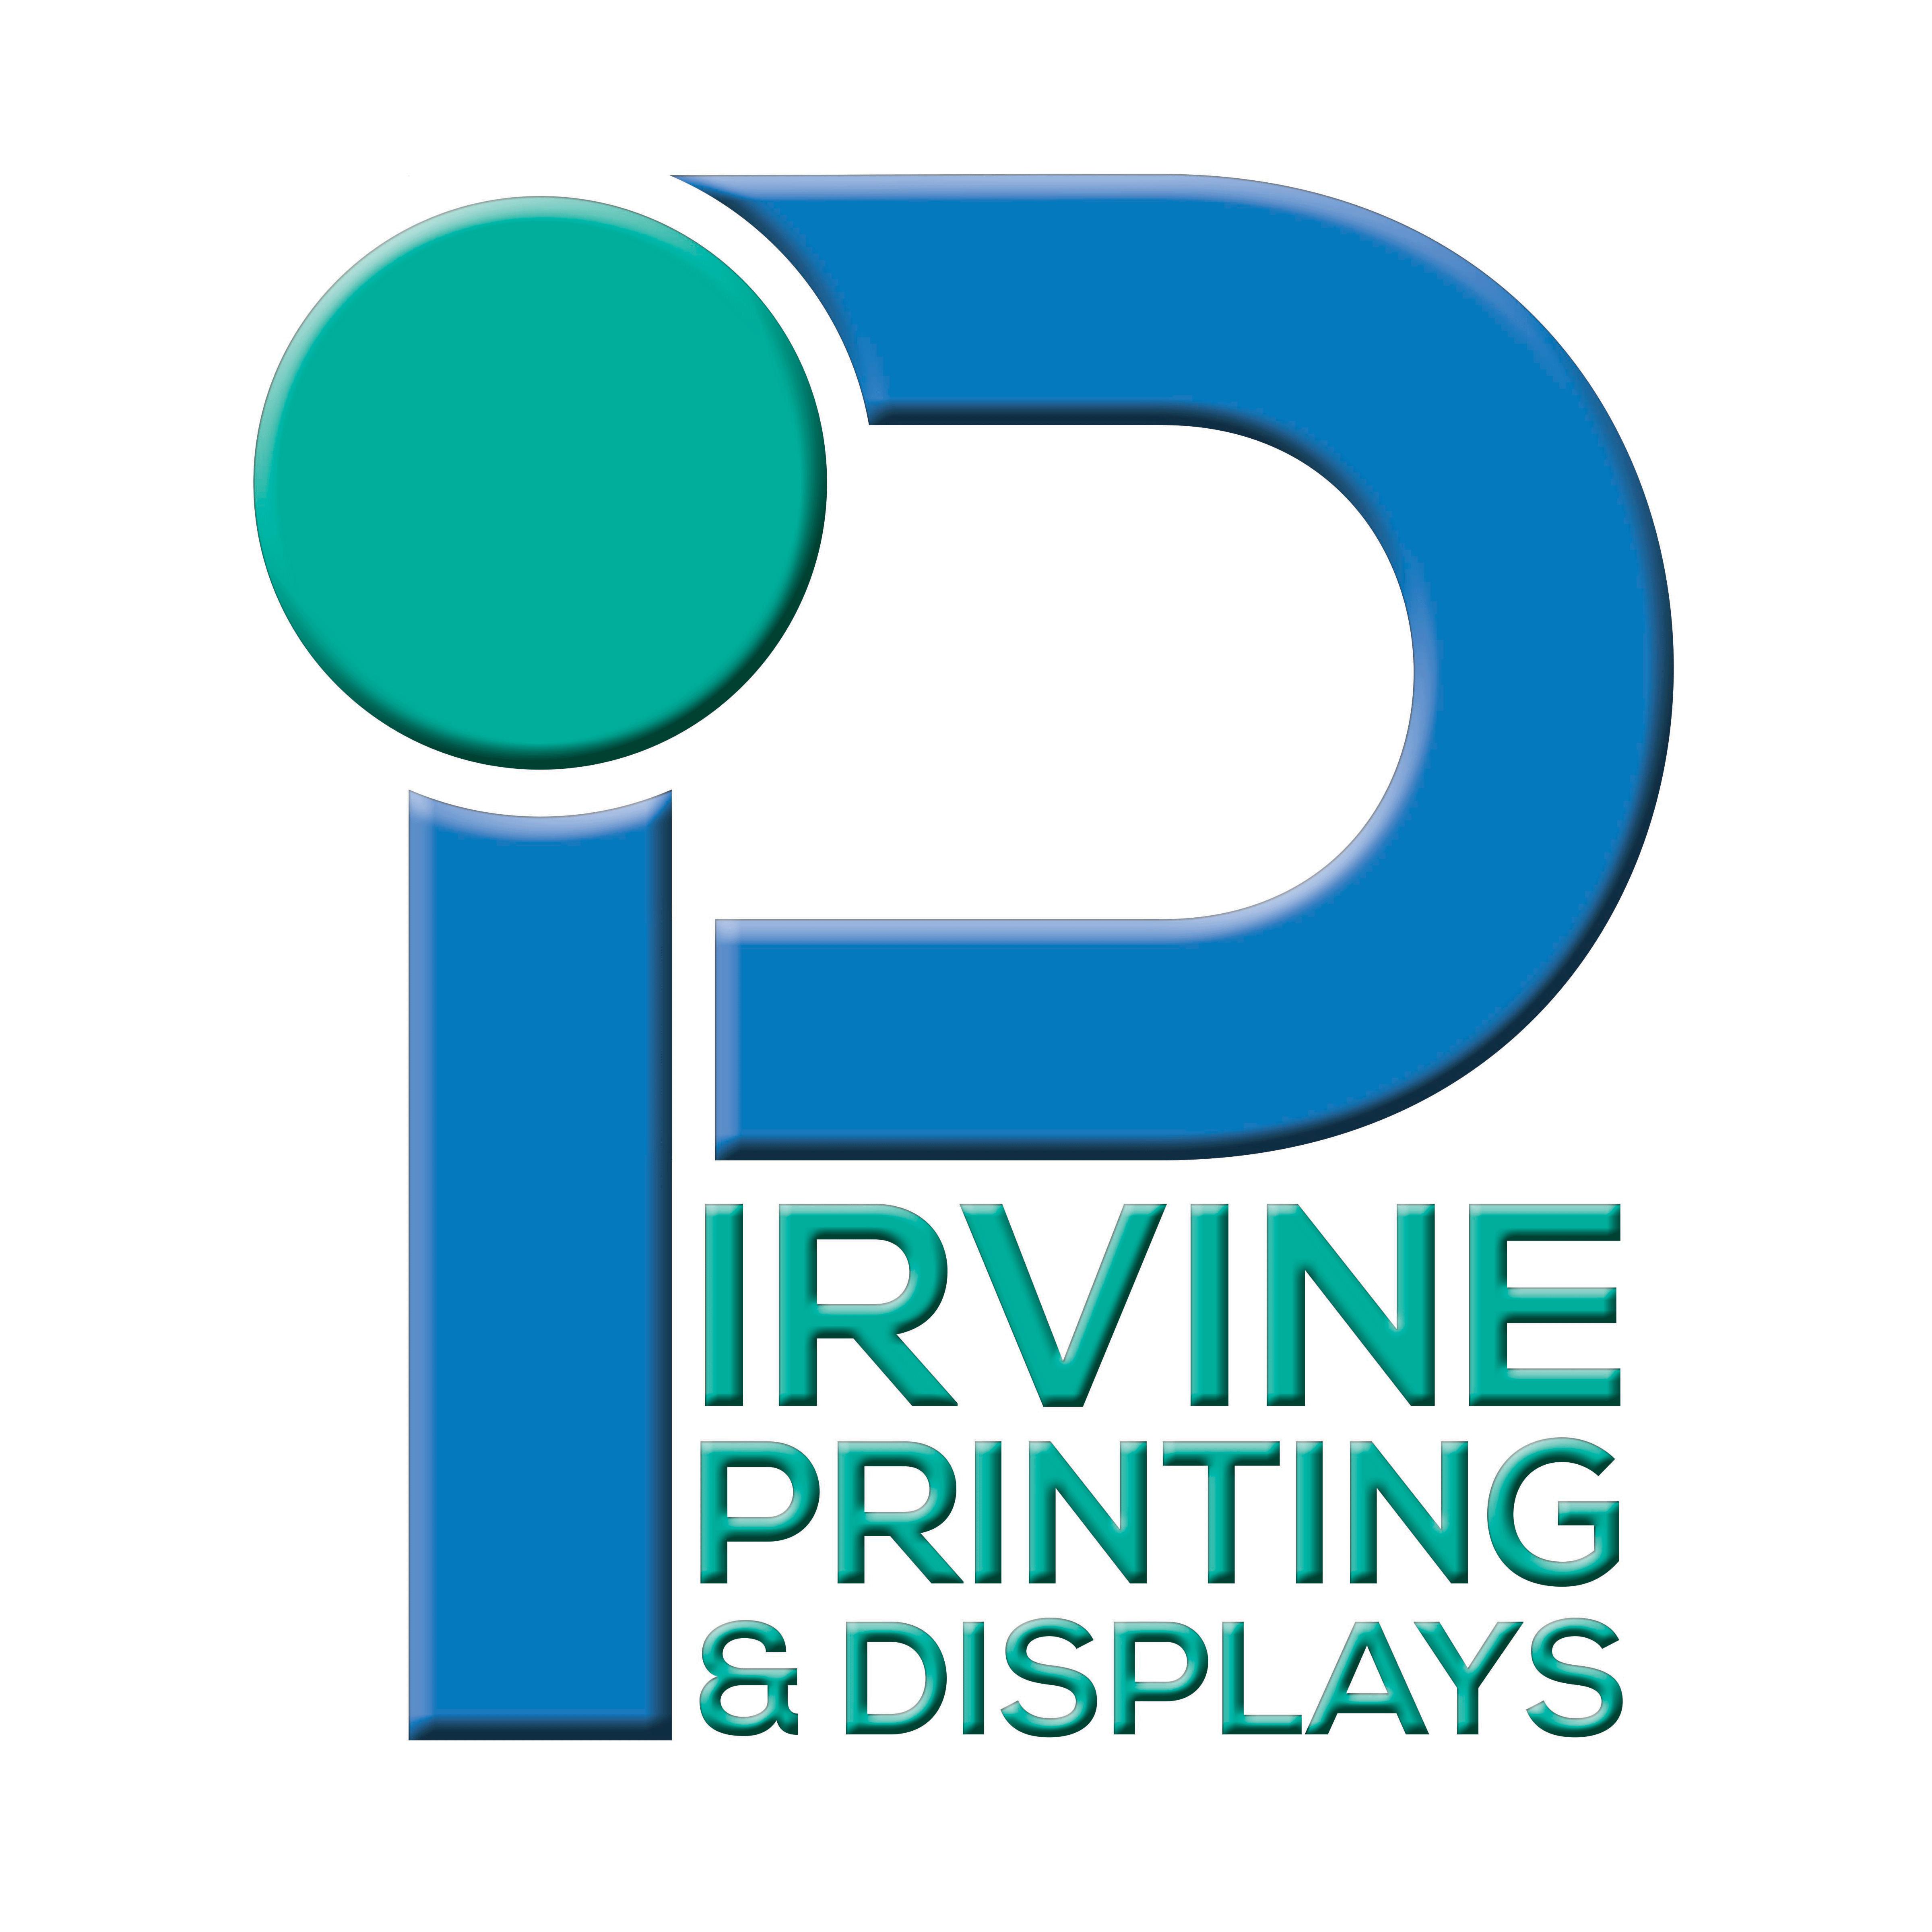 Irvine Printing - Irvine, CA - Copying & Printing Services